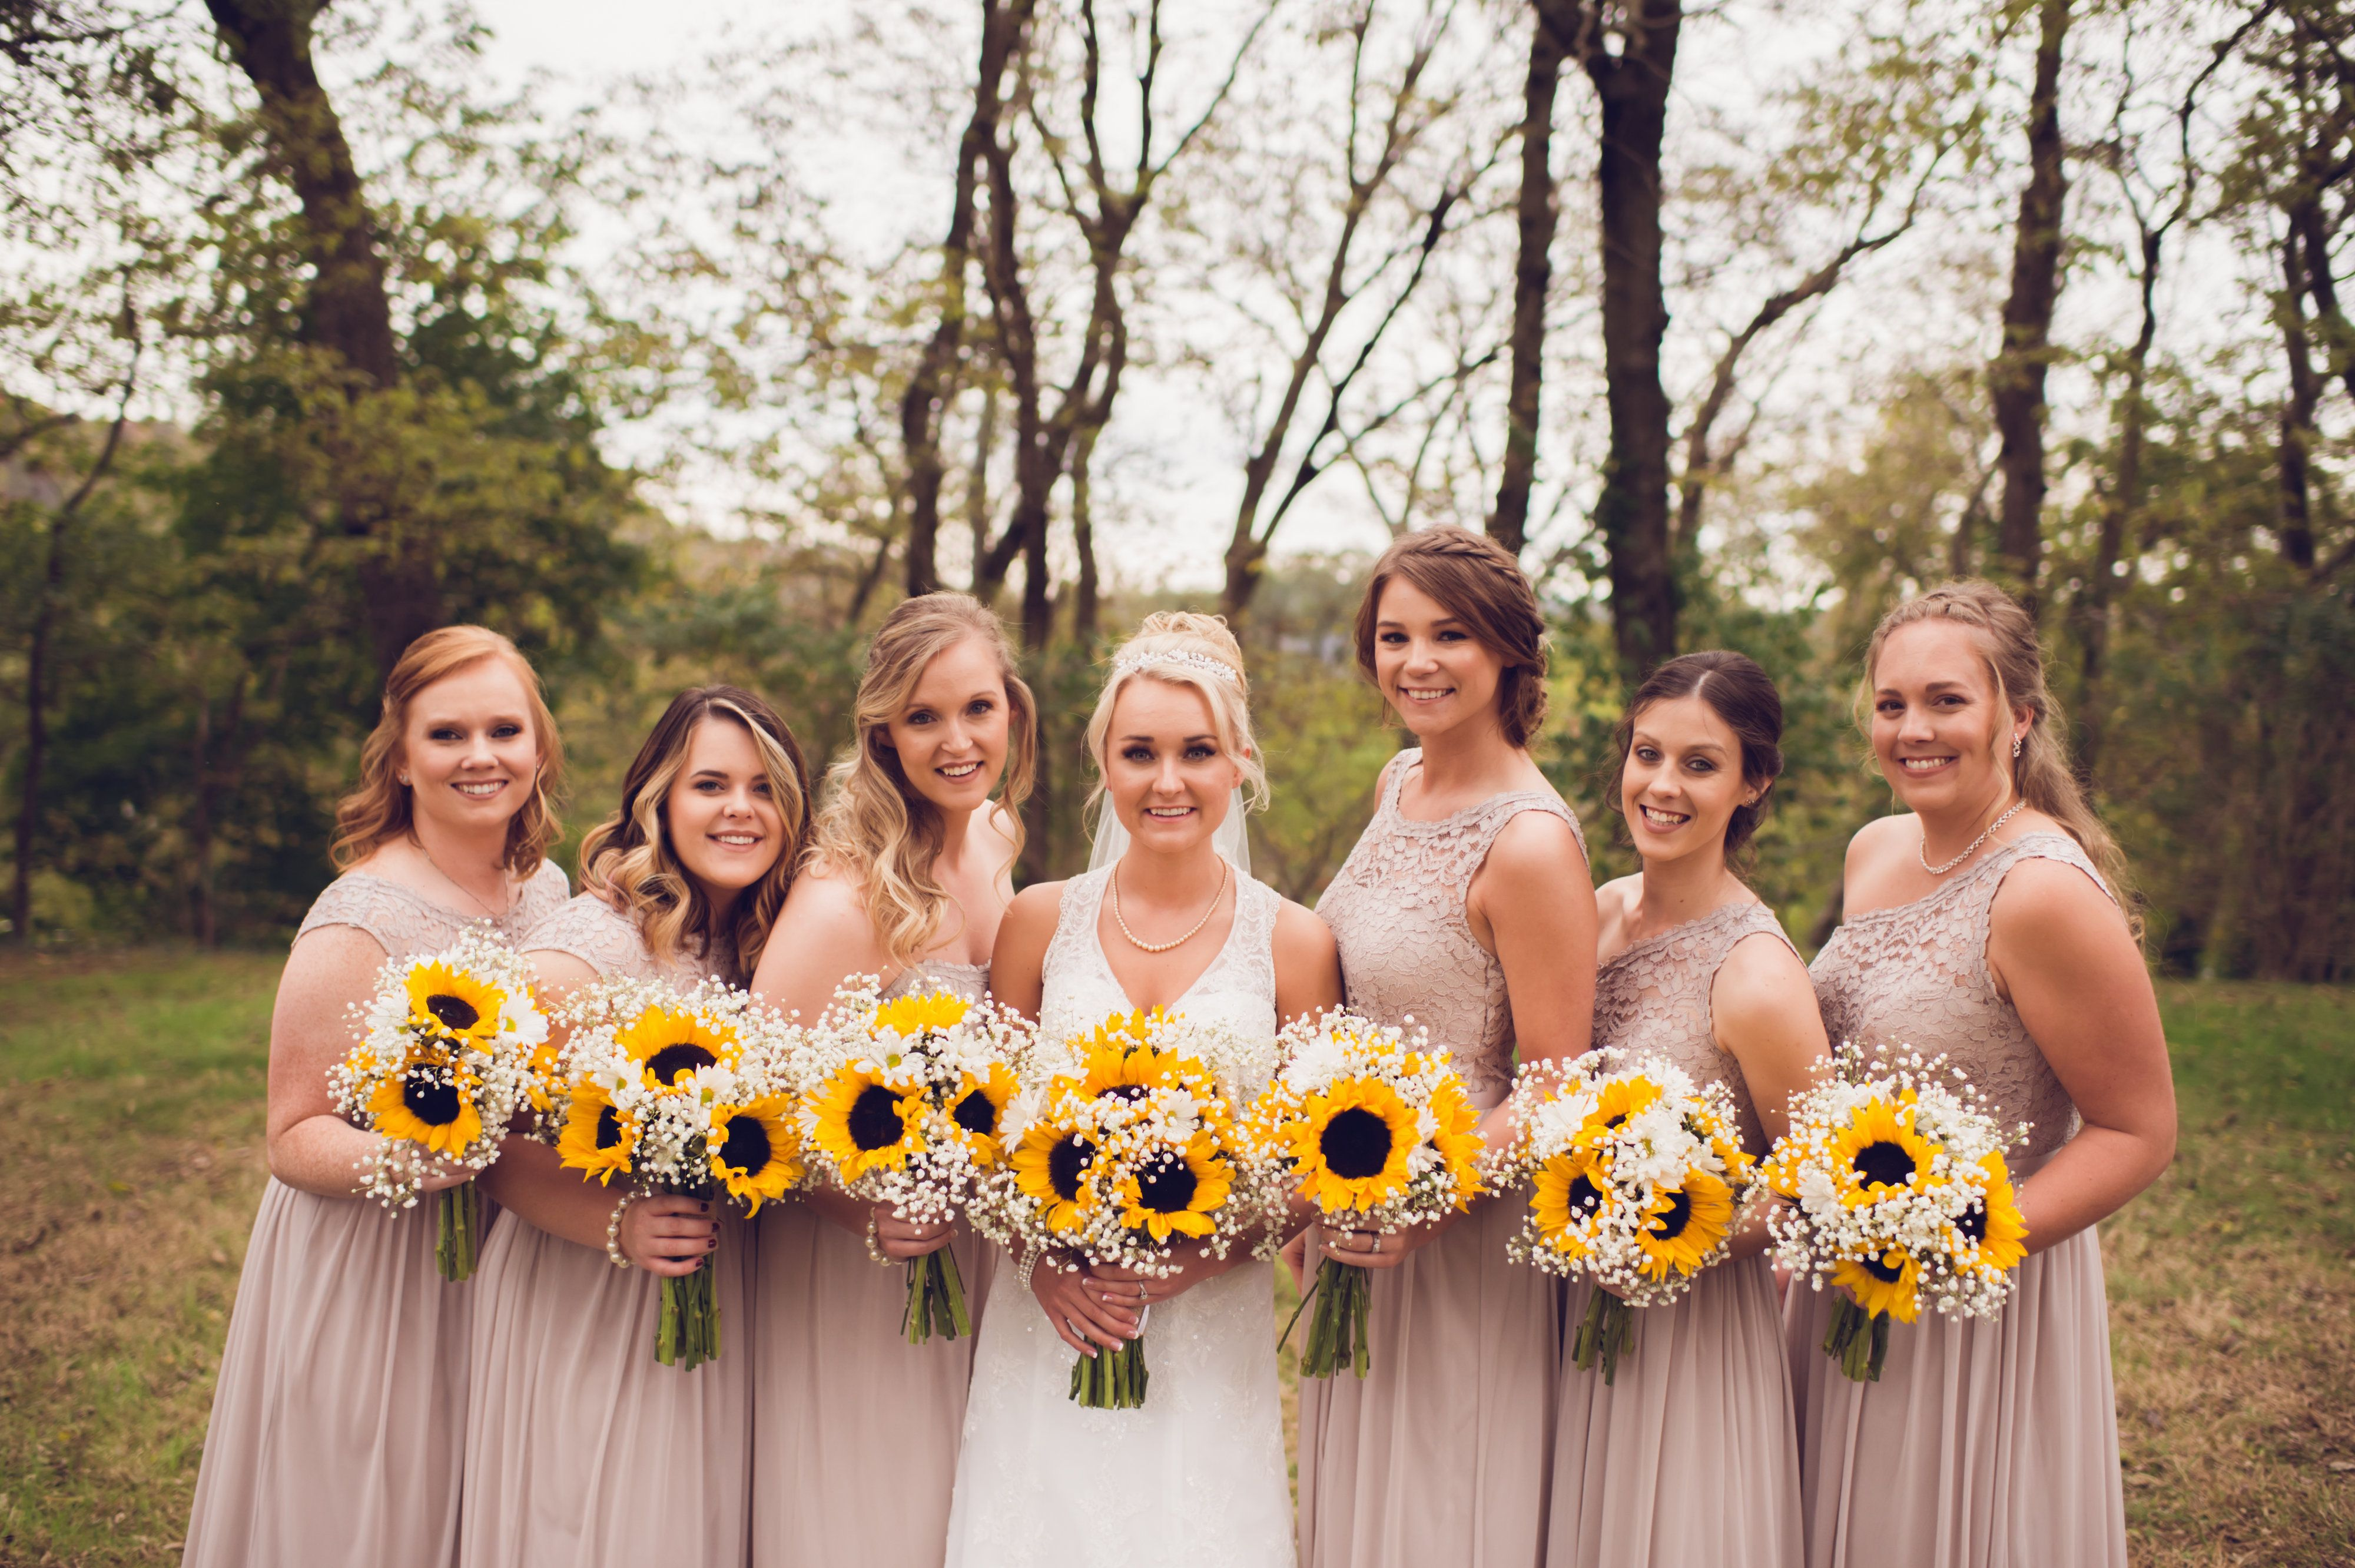 David S Bridal Bridesmaid Dresses Biscotti Bridesmaid Dresses Taupe Bridesmaid Dresse Sunflower Bridesmaid Bouquet Sunflower Themed Wedding Blush Wedding Theme